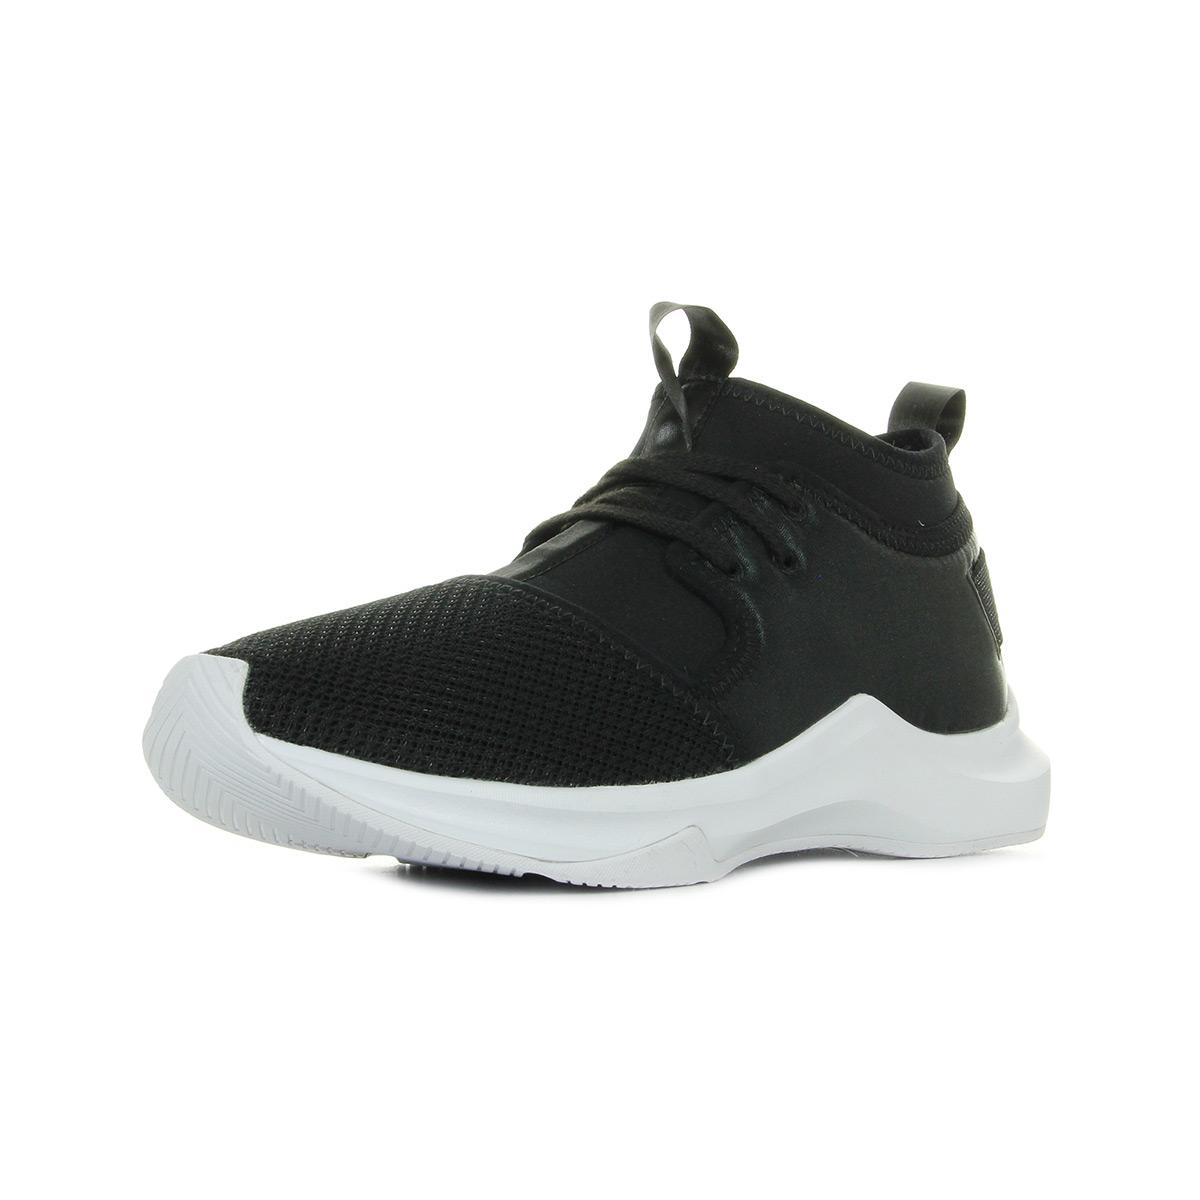 Chaussures Baskets Puma femme Phenom Low Satin EP Wn's taille Noir Noire